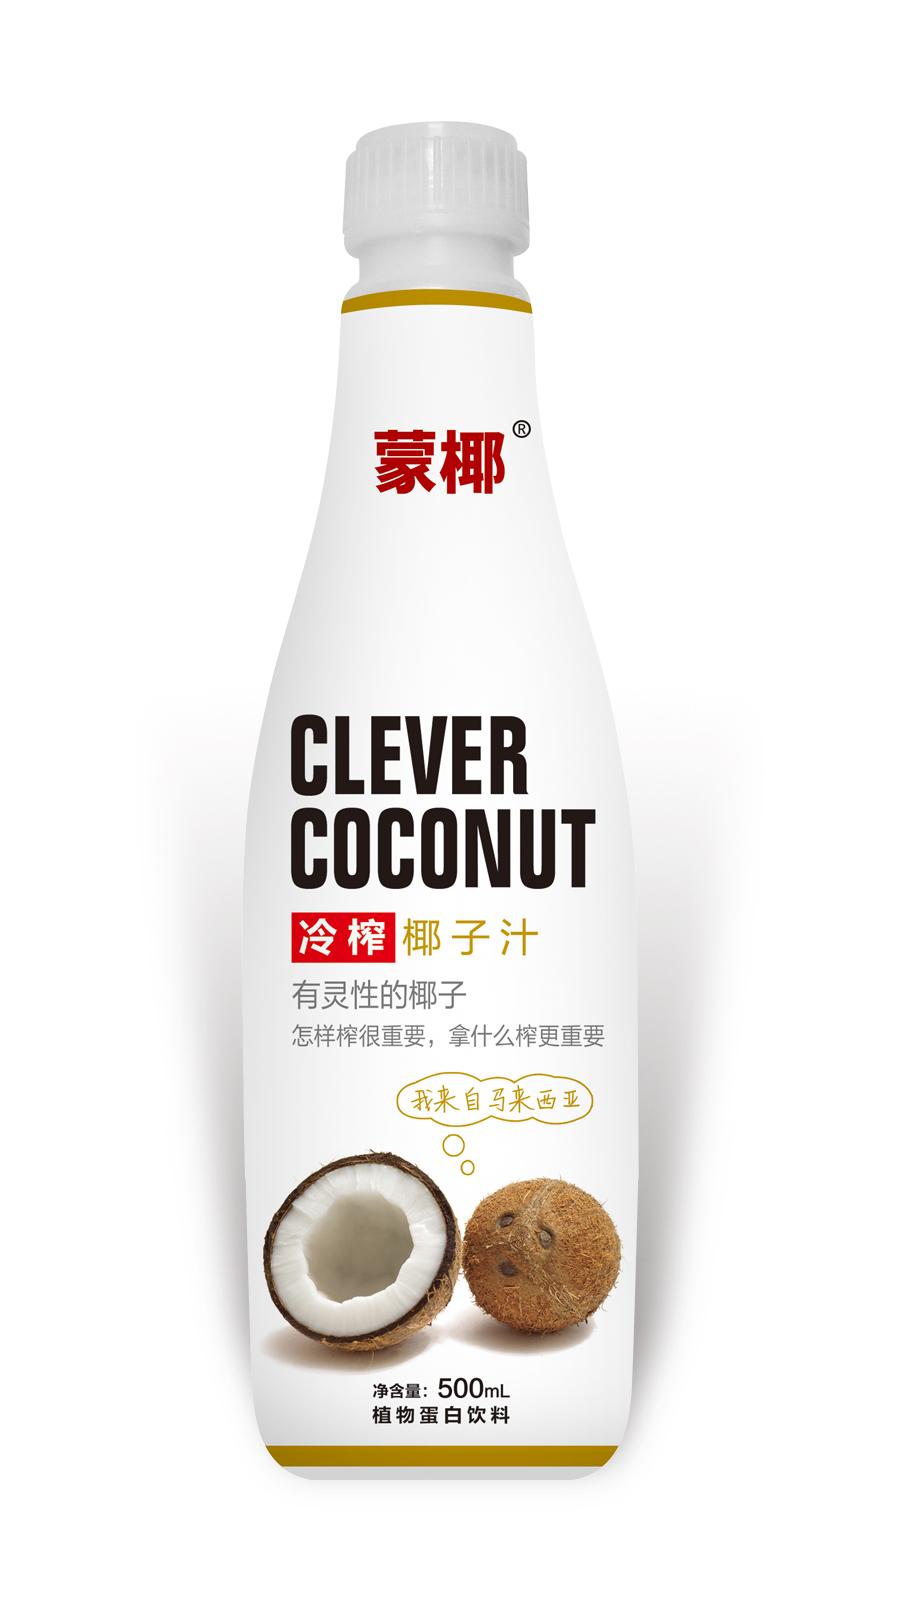 500mL蒙椰 冷榨椰子汁